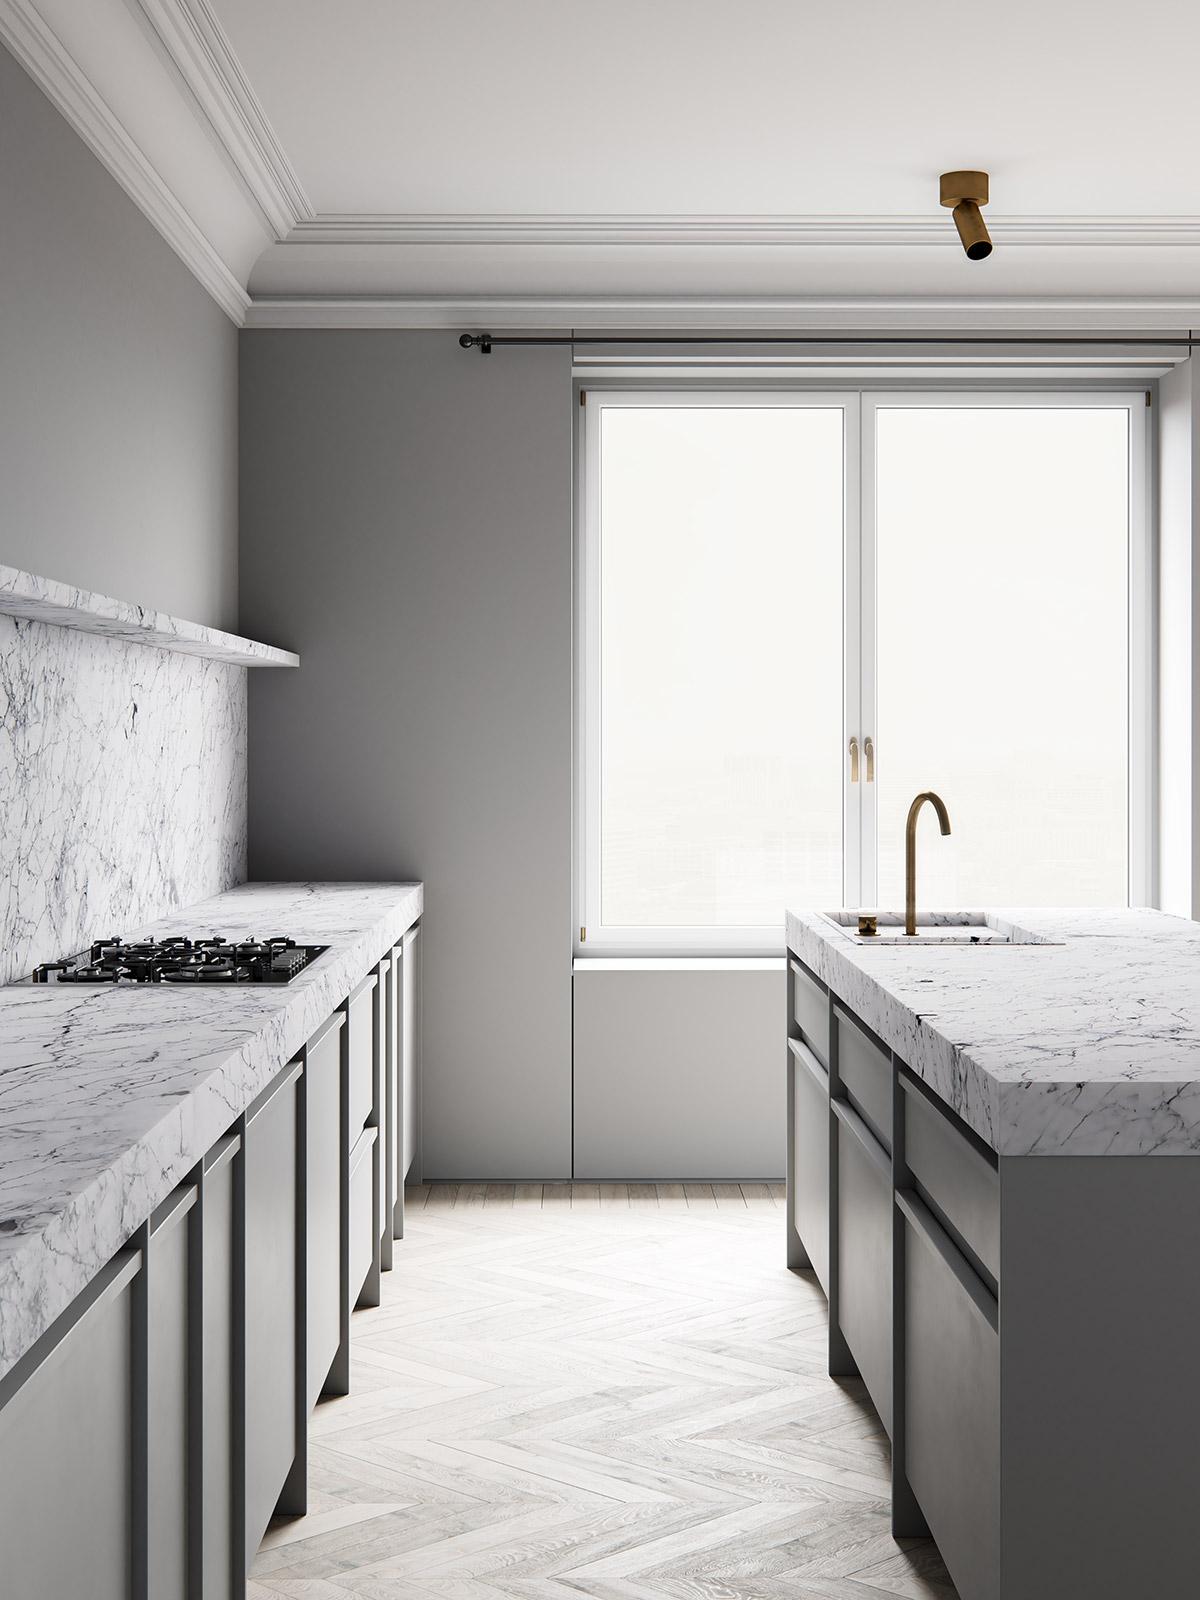 3d interior render. ScreenAge featured project - MIST Kitchen